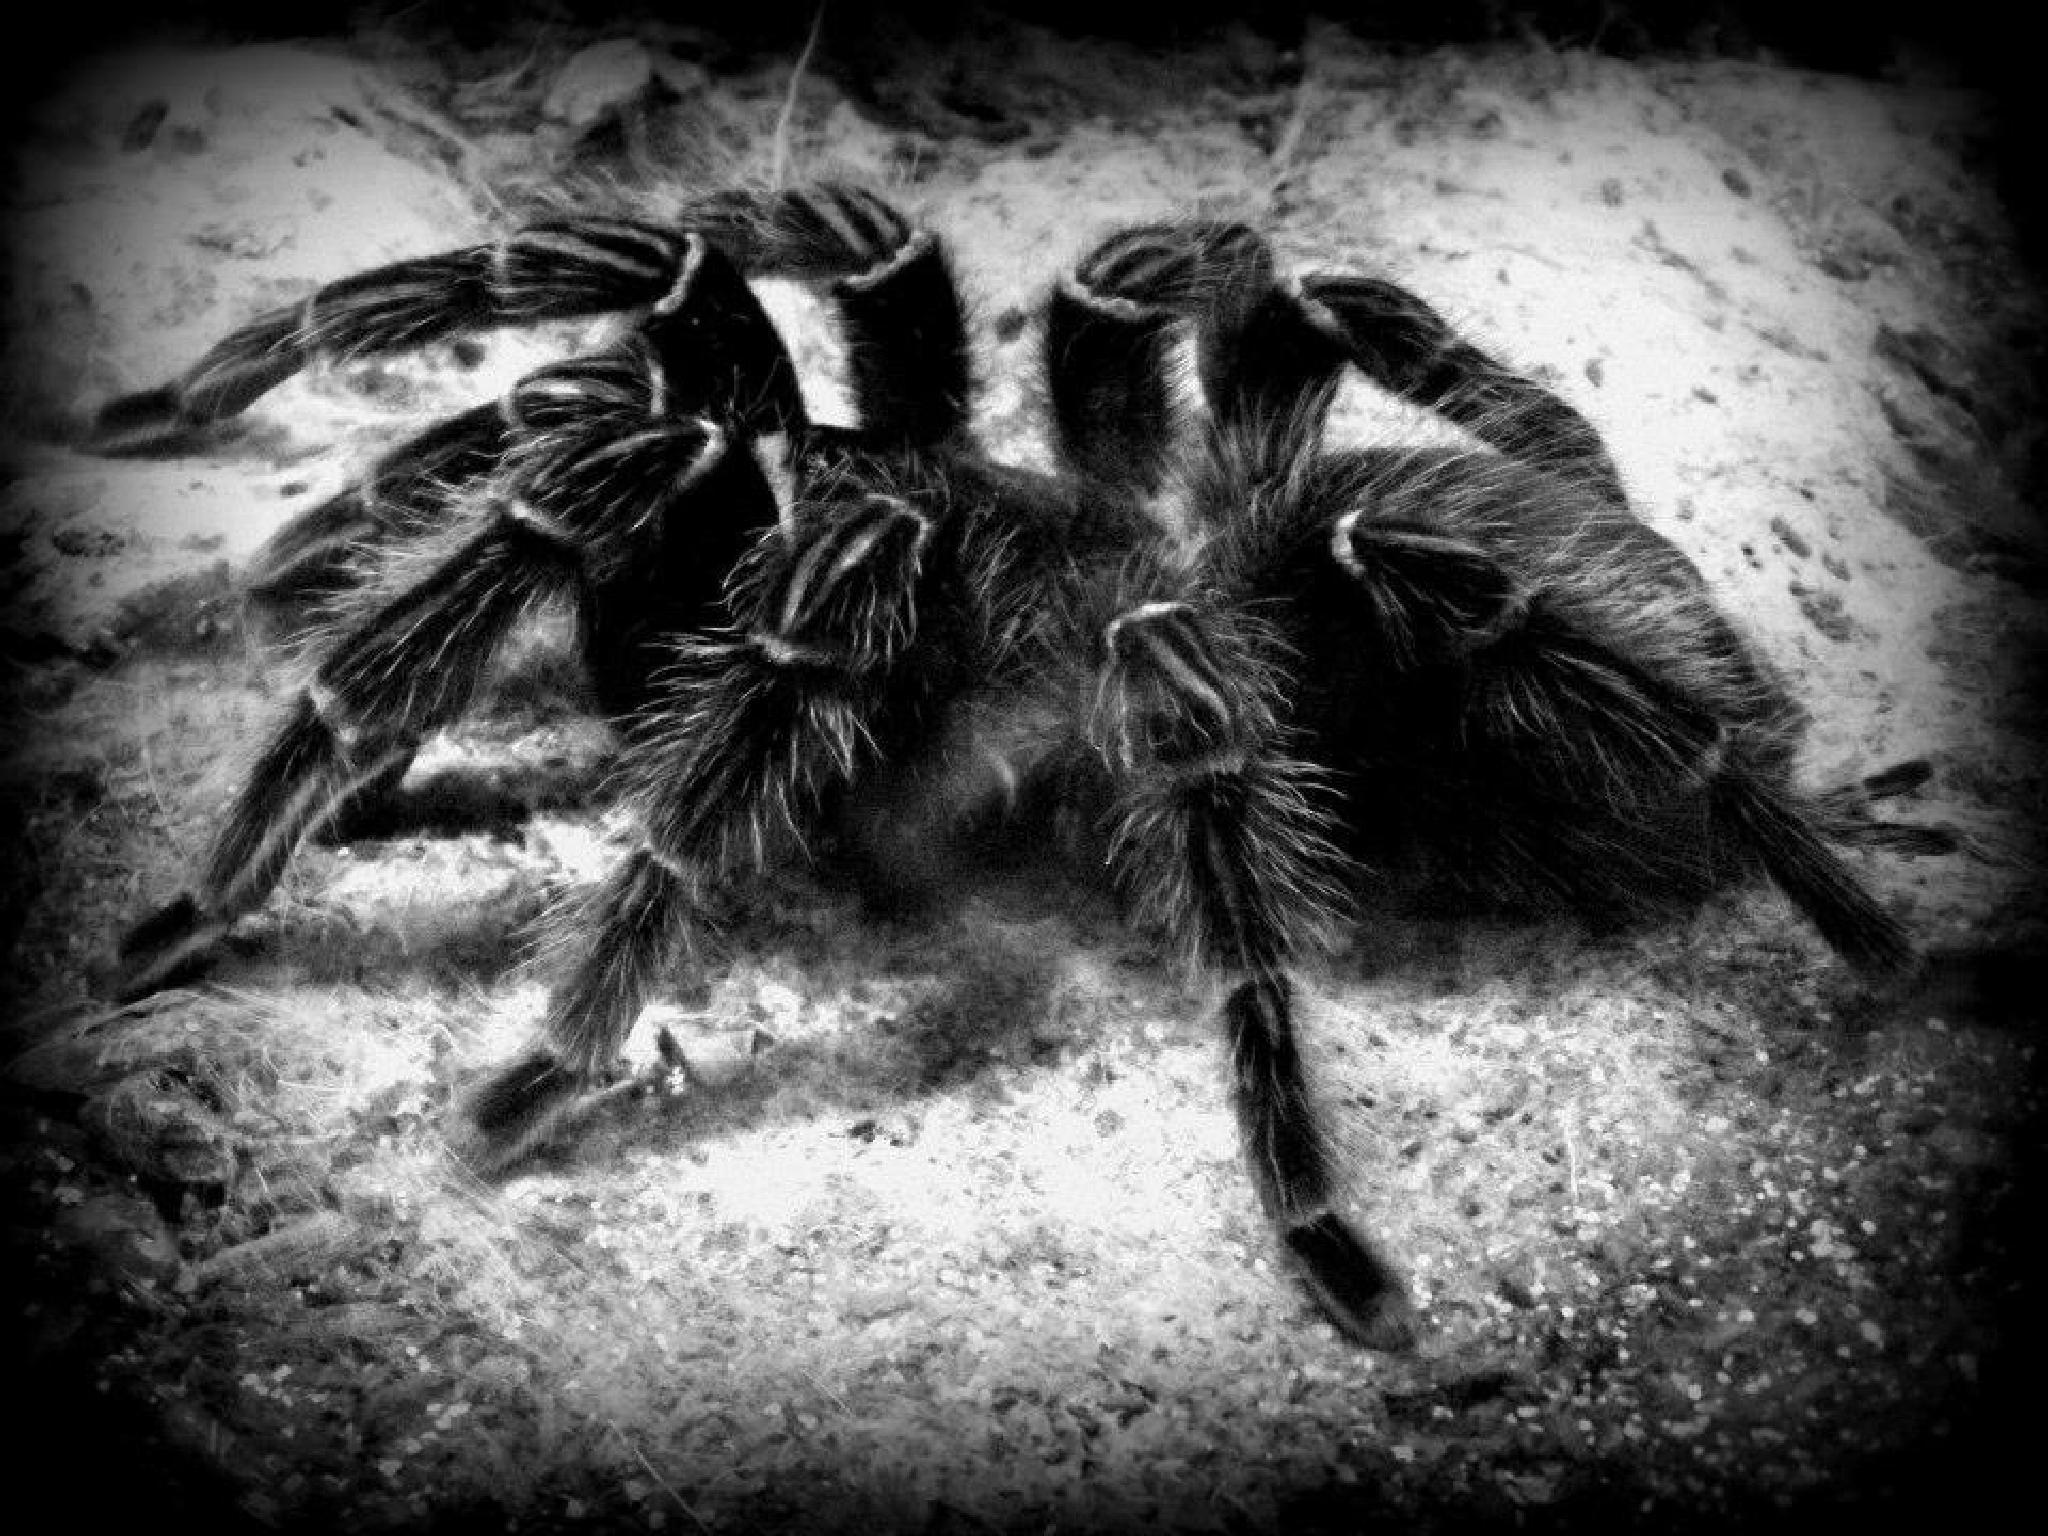 Spider by aggiej08